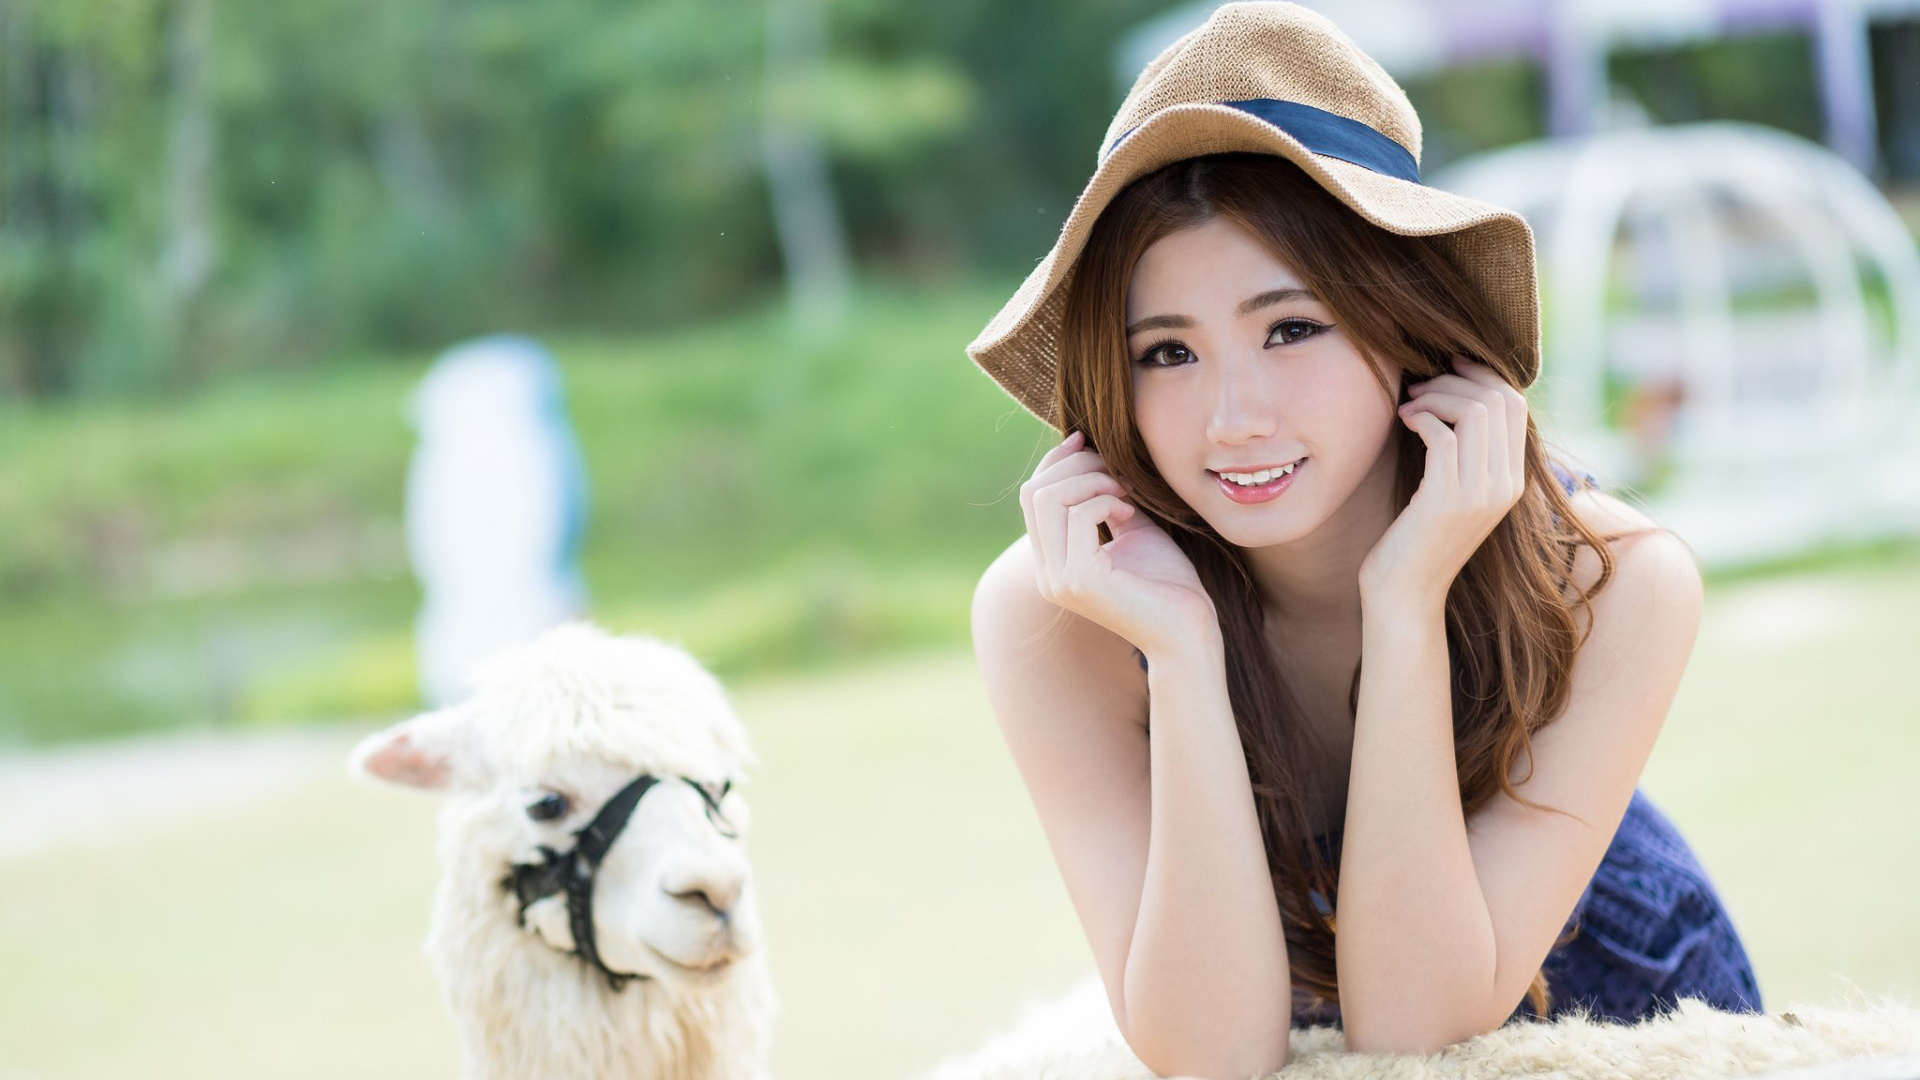 s是幸福的,微笑的,微笑的,在经历了一次大的婚姻改变后,充满了少女的感觉。